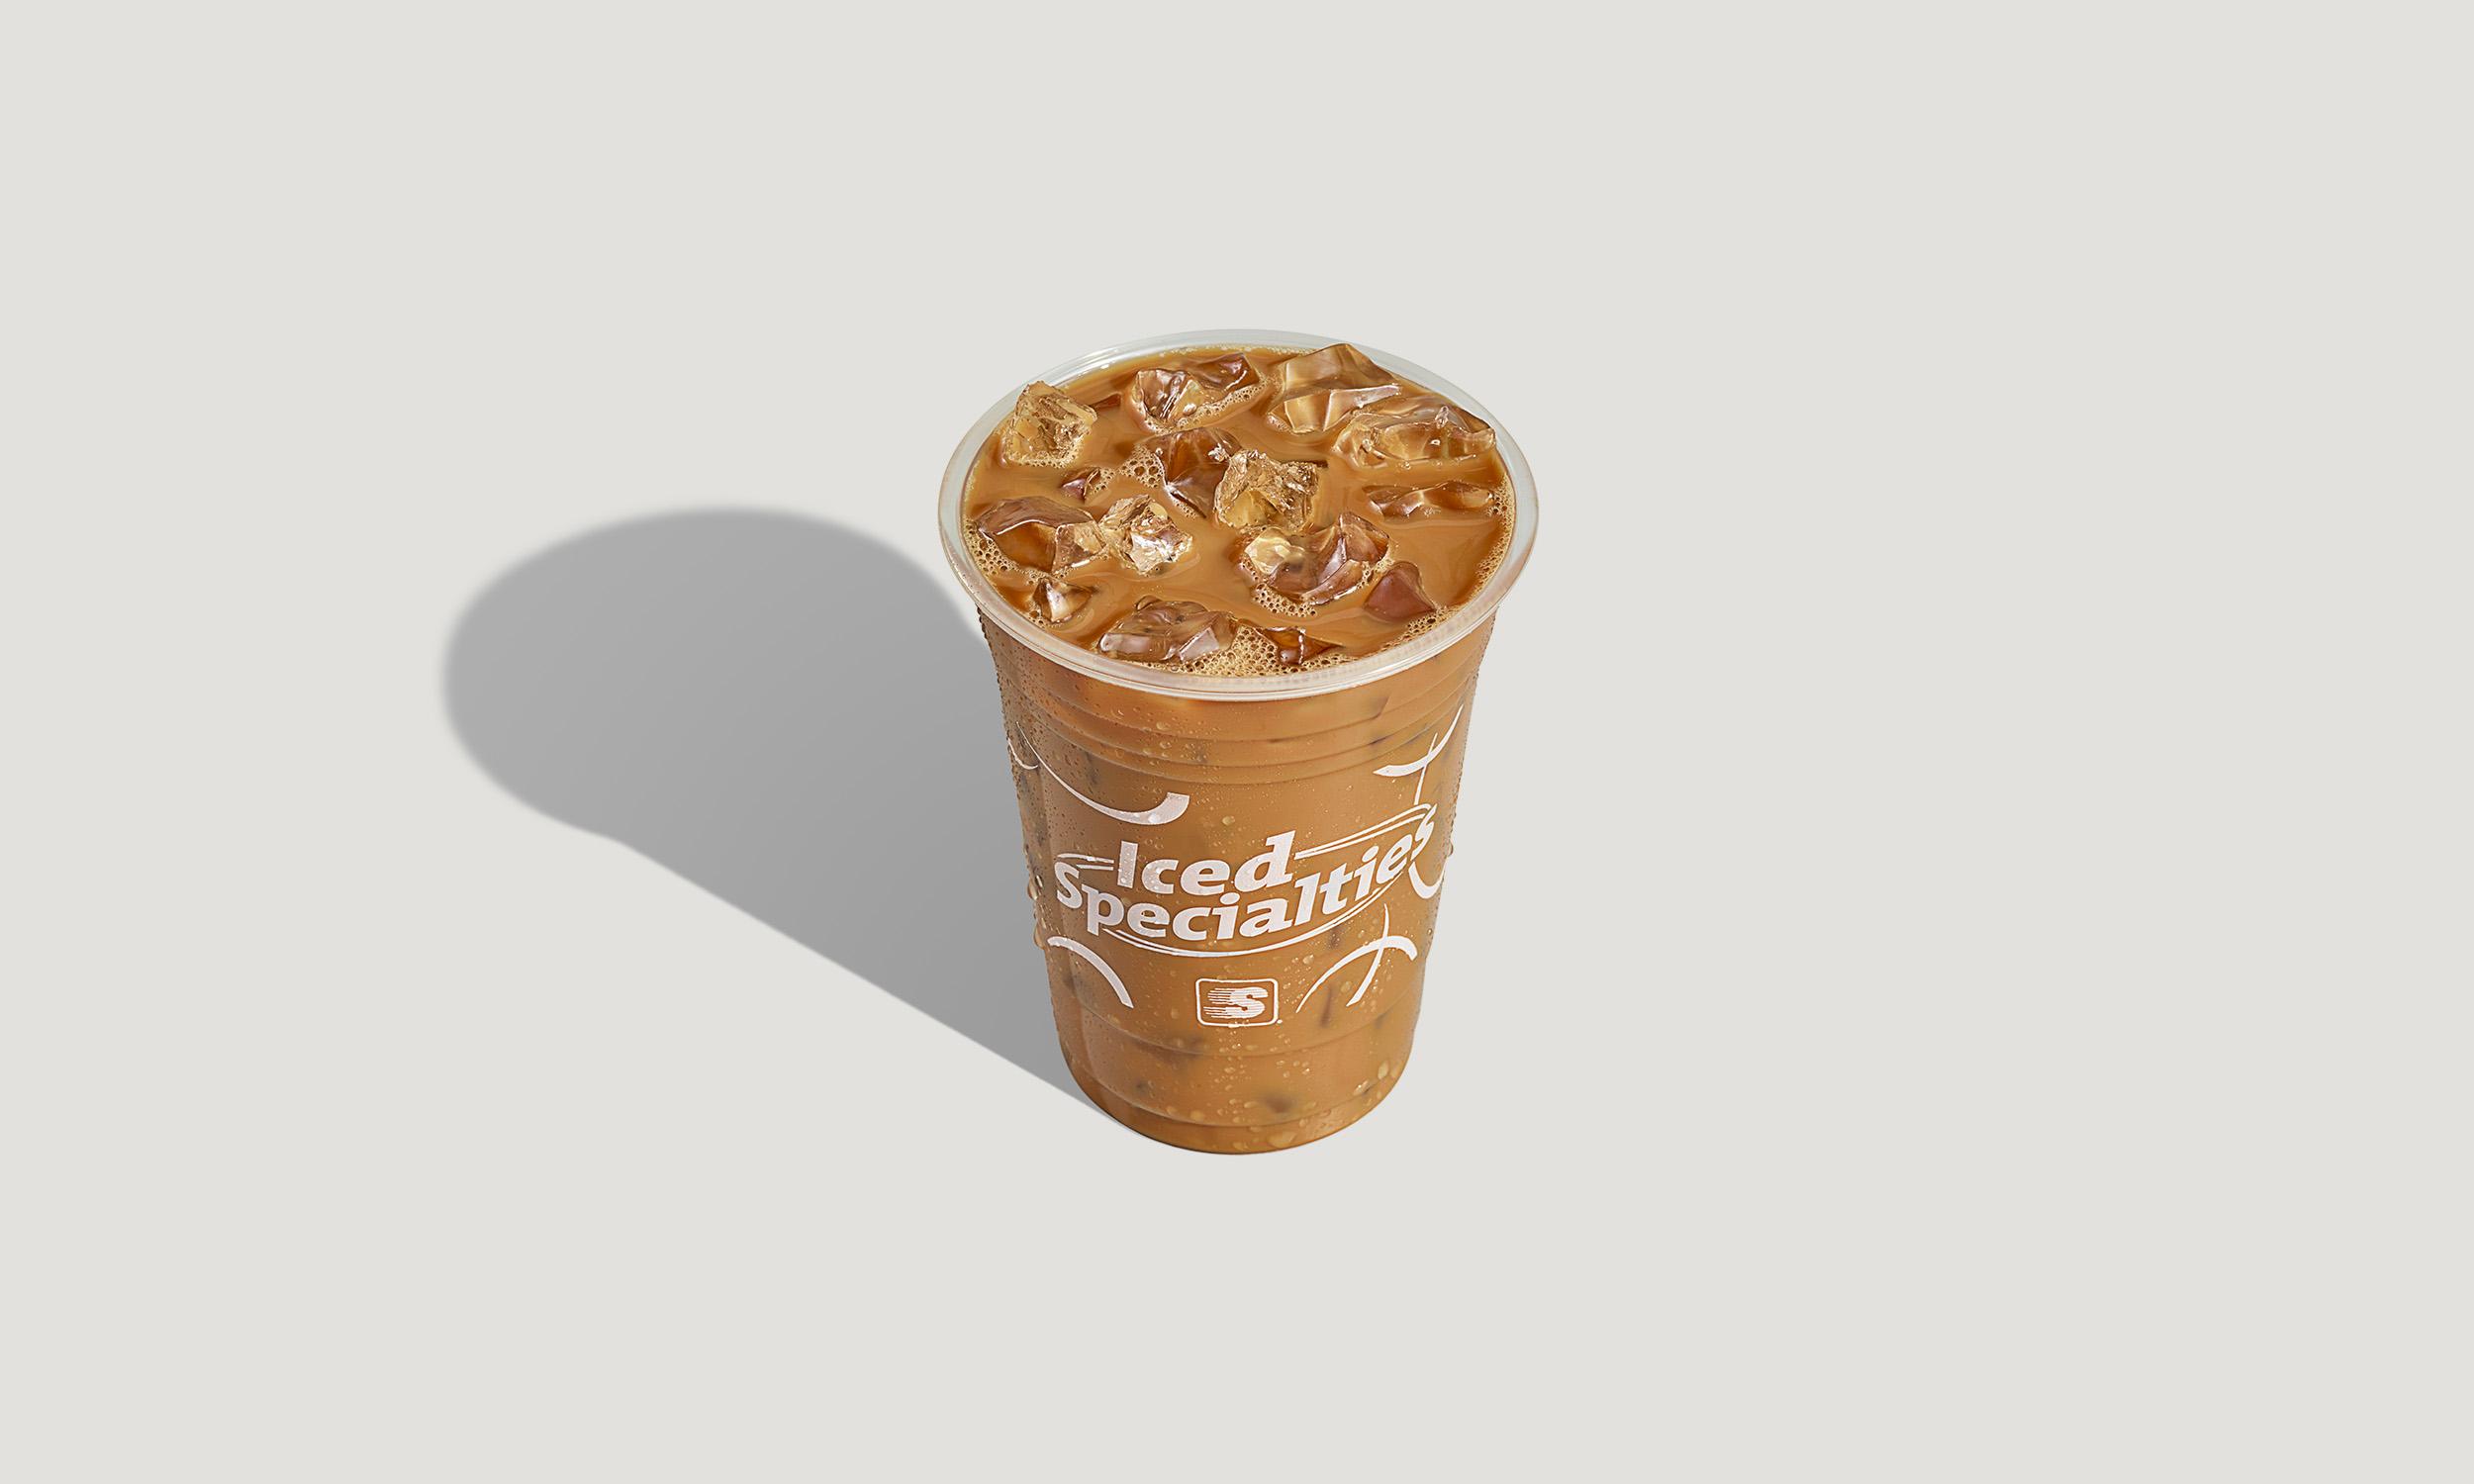 Speedway_IsometricProductPhotography_Iced Coffee.jpg